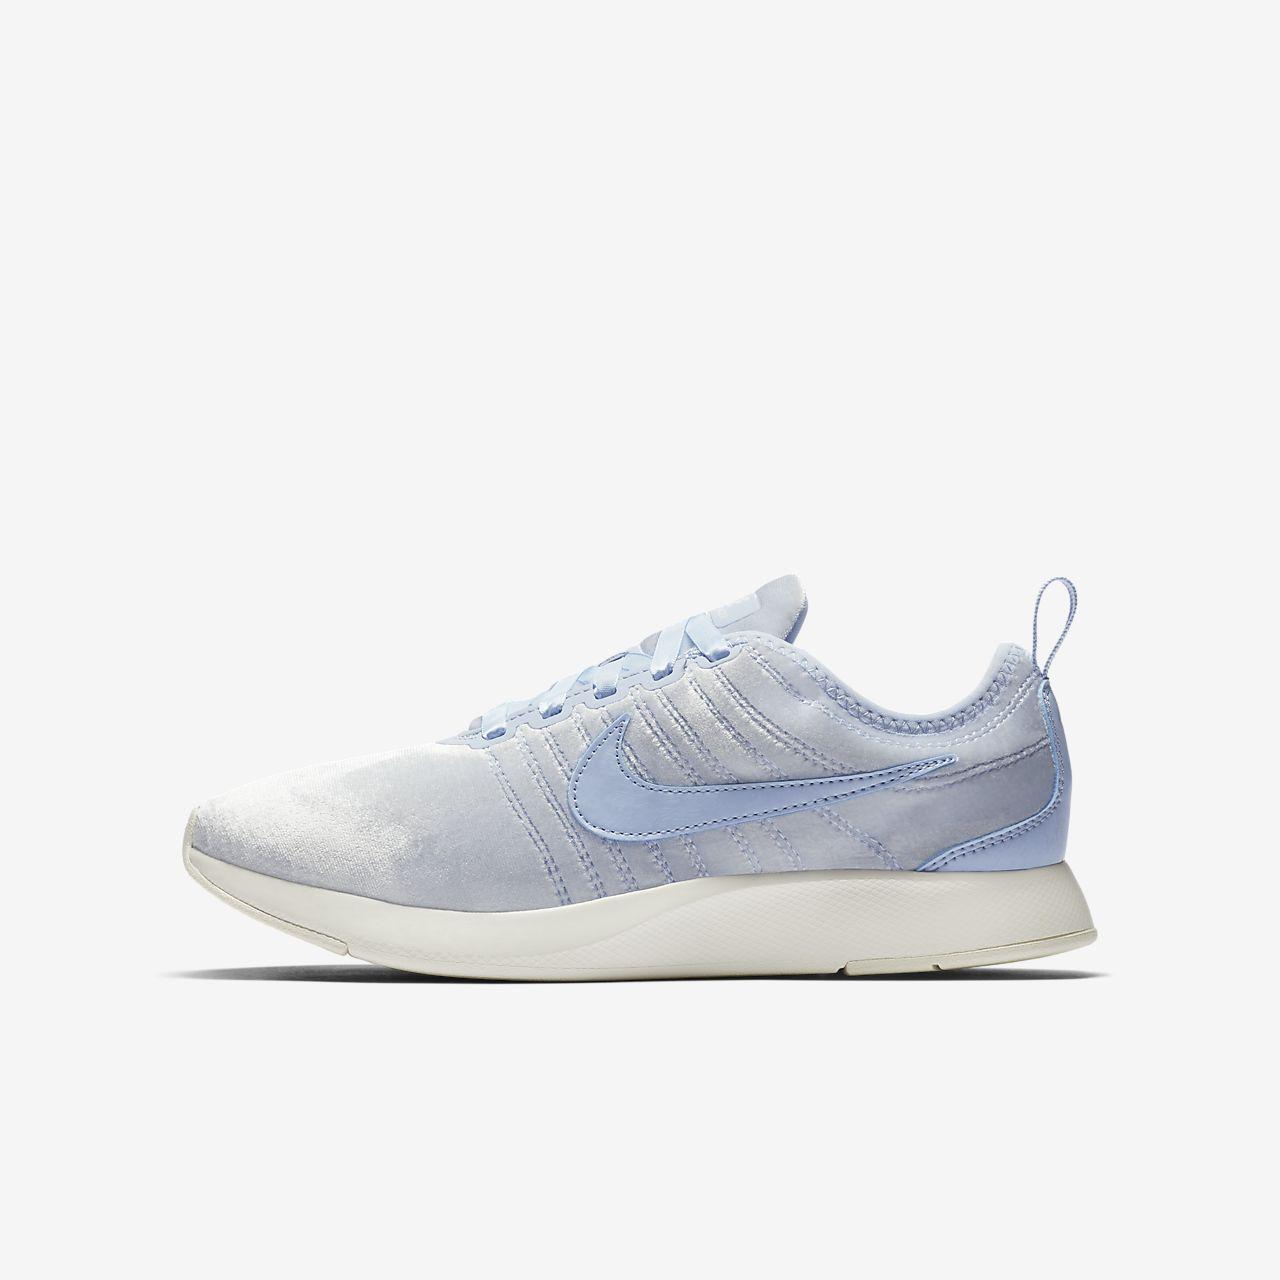 newest 9c882 4a1b5 ... Nike Dualtone Racer SE Older Kids Shoe